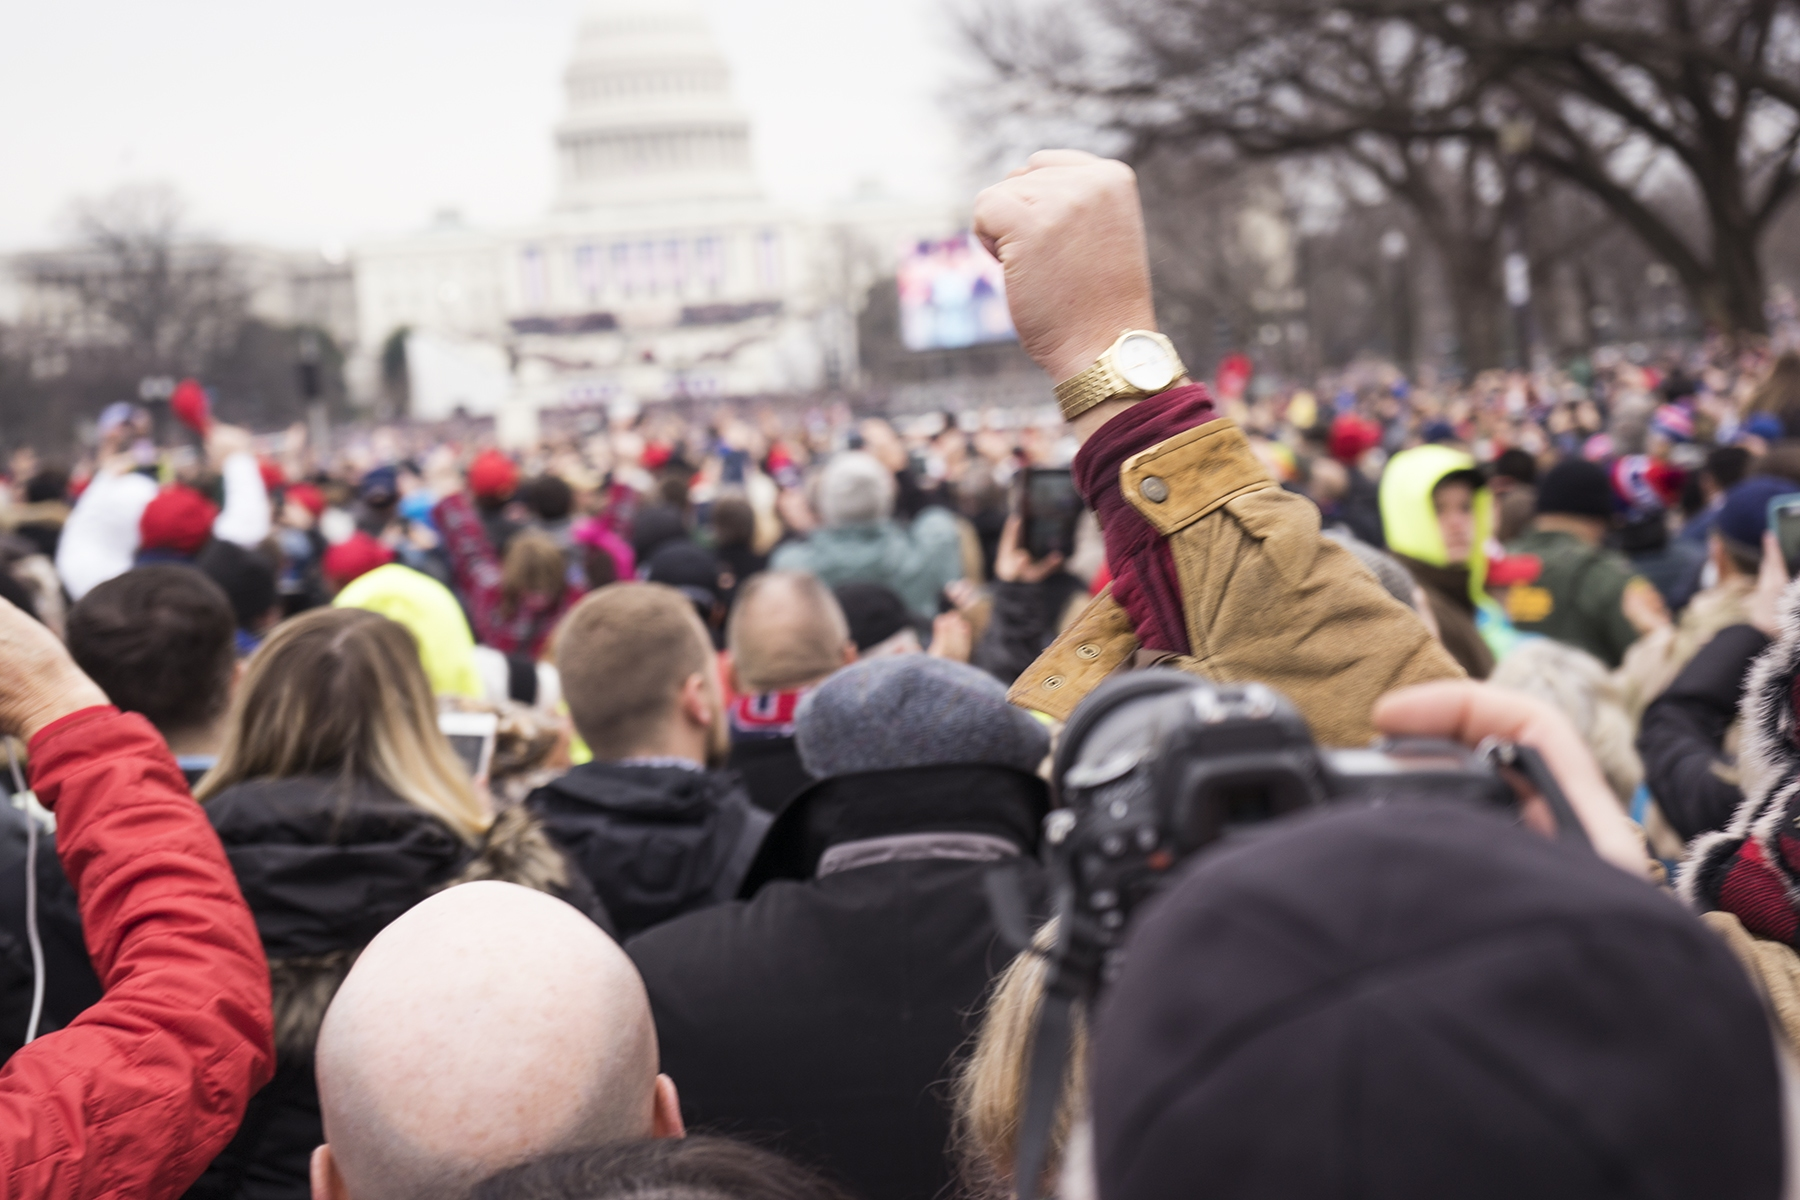 inauguration, 2017, president elect, donald trump, protest, january 20, washington dc, people, street,